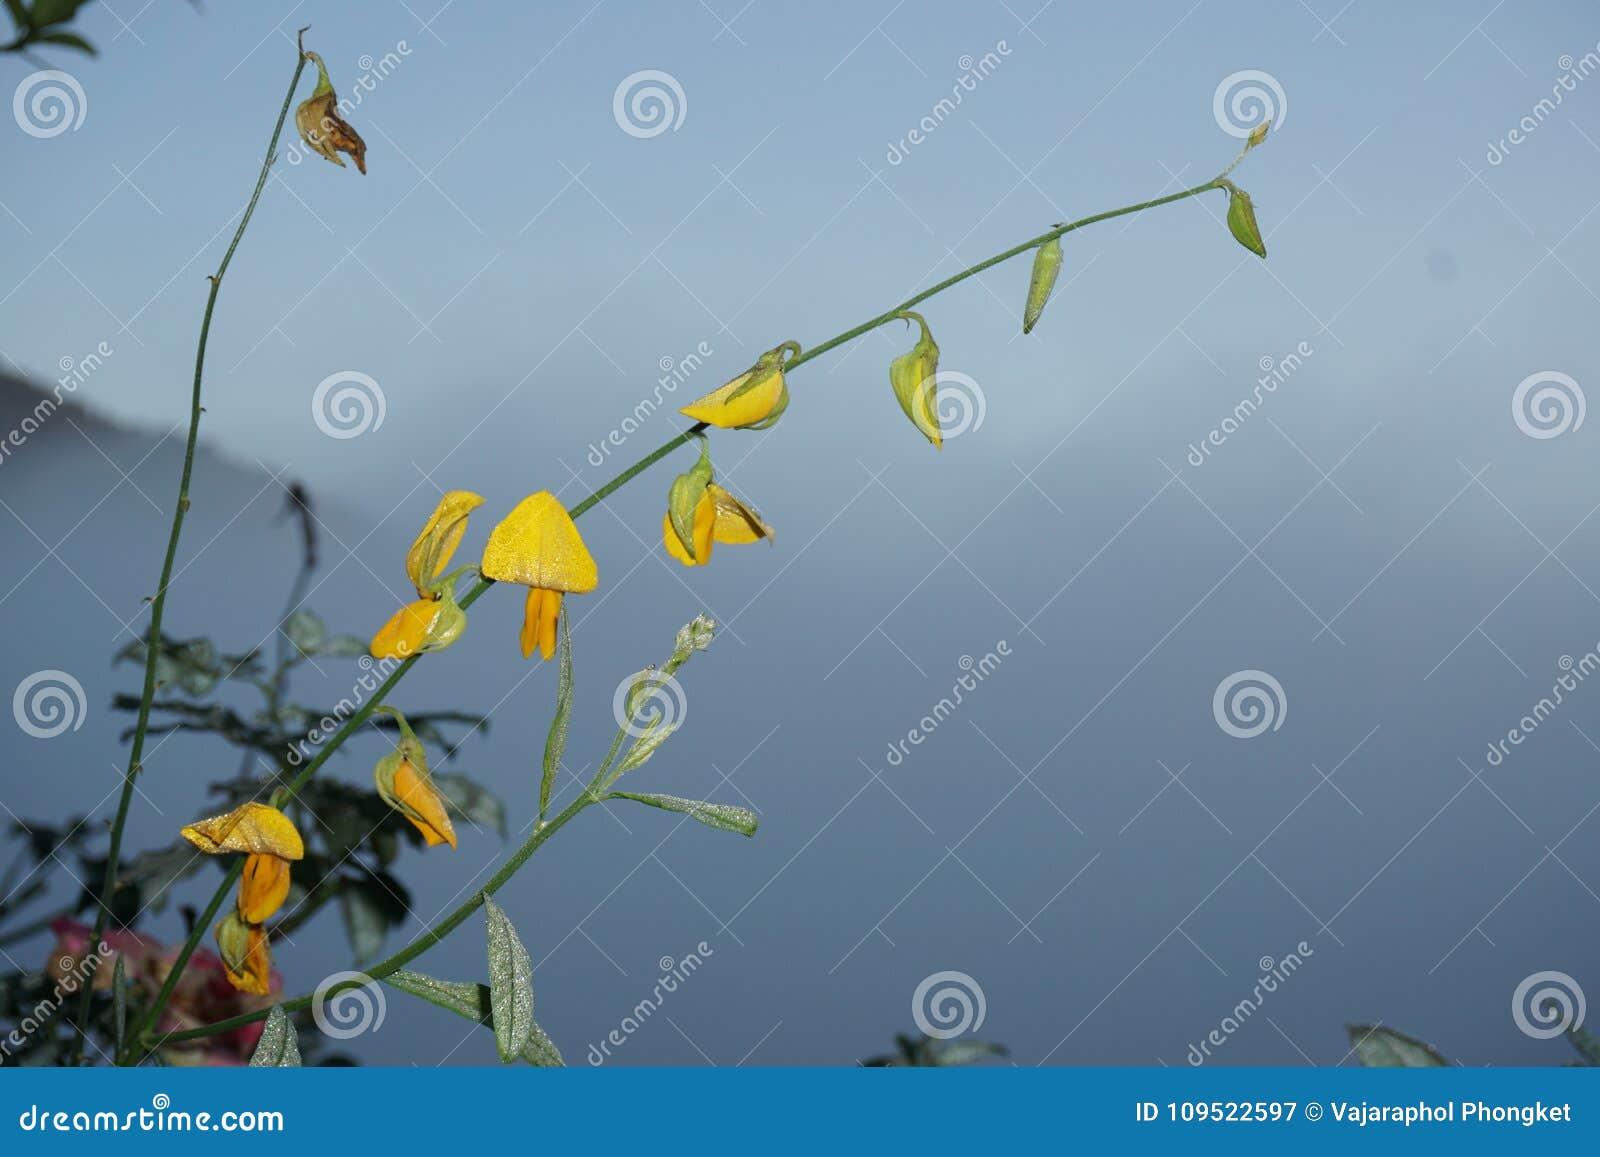 Closeup yellow flower of sunhemp or Crotalaria juncea in scientific name